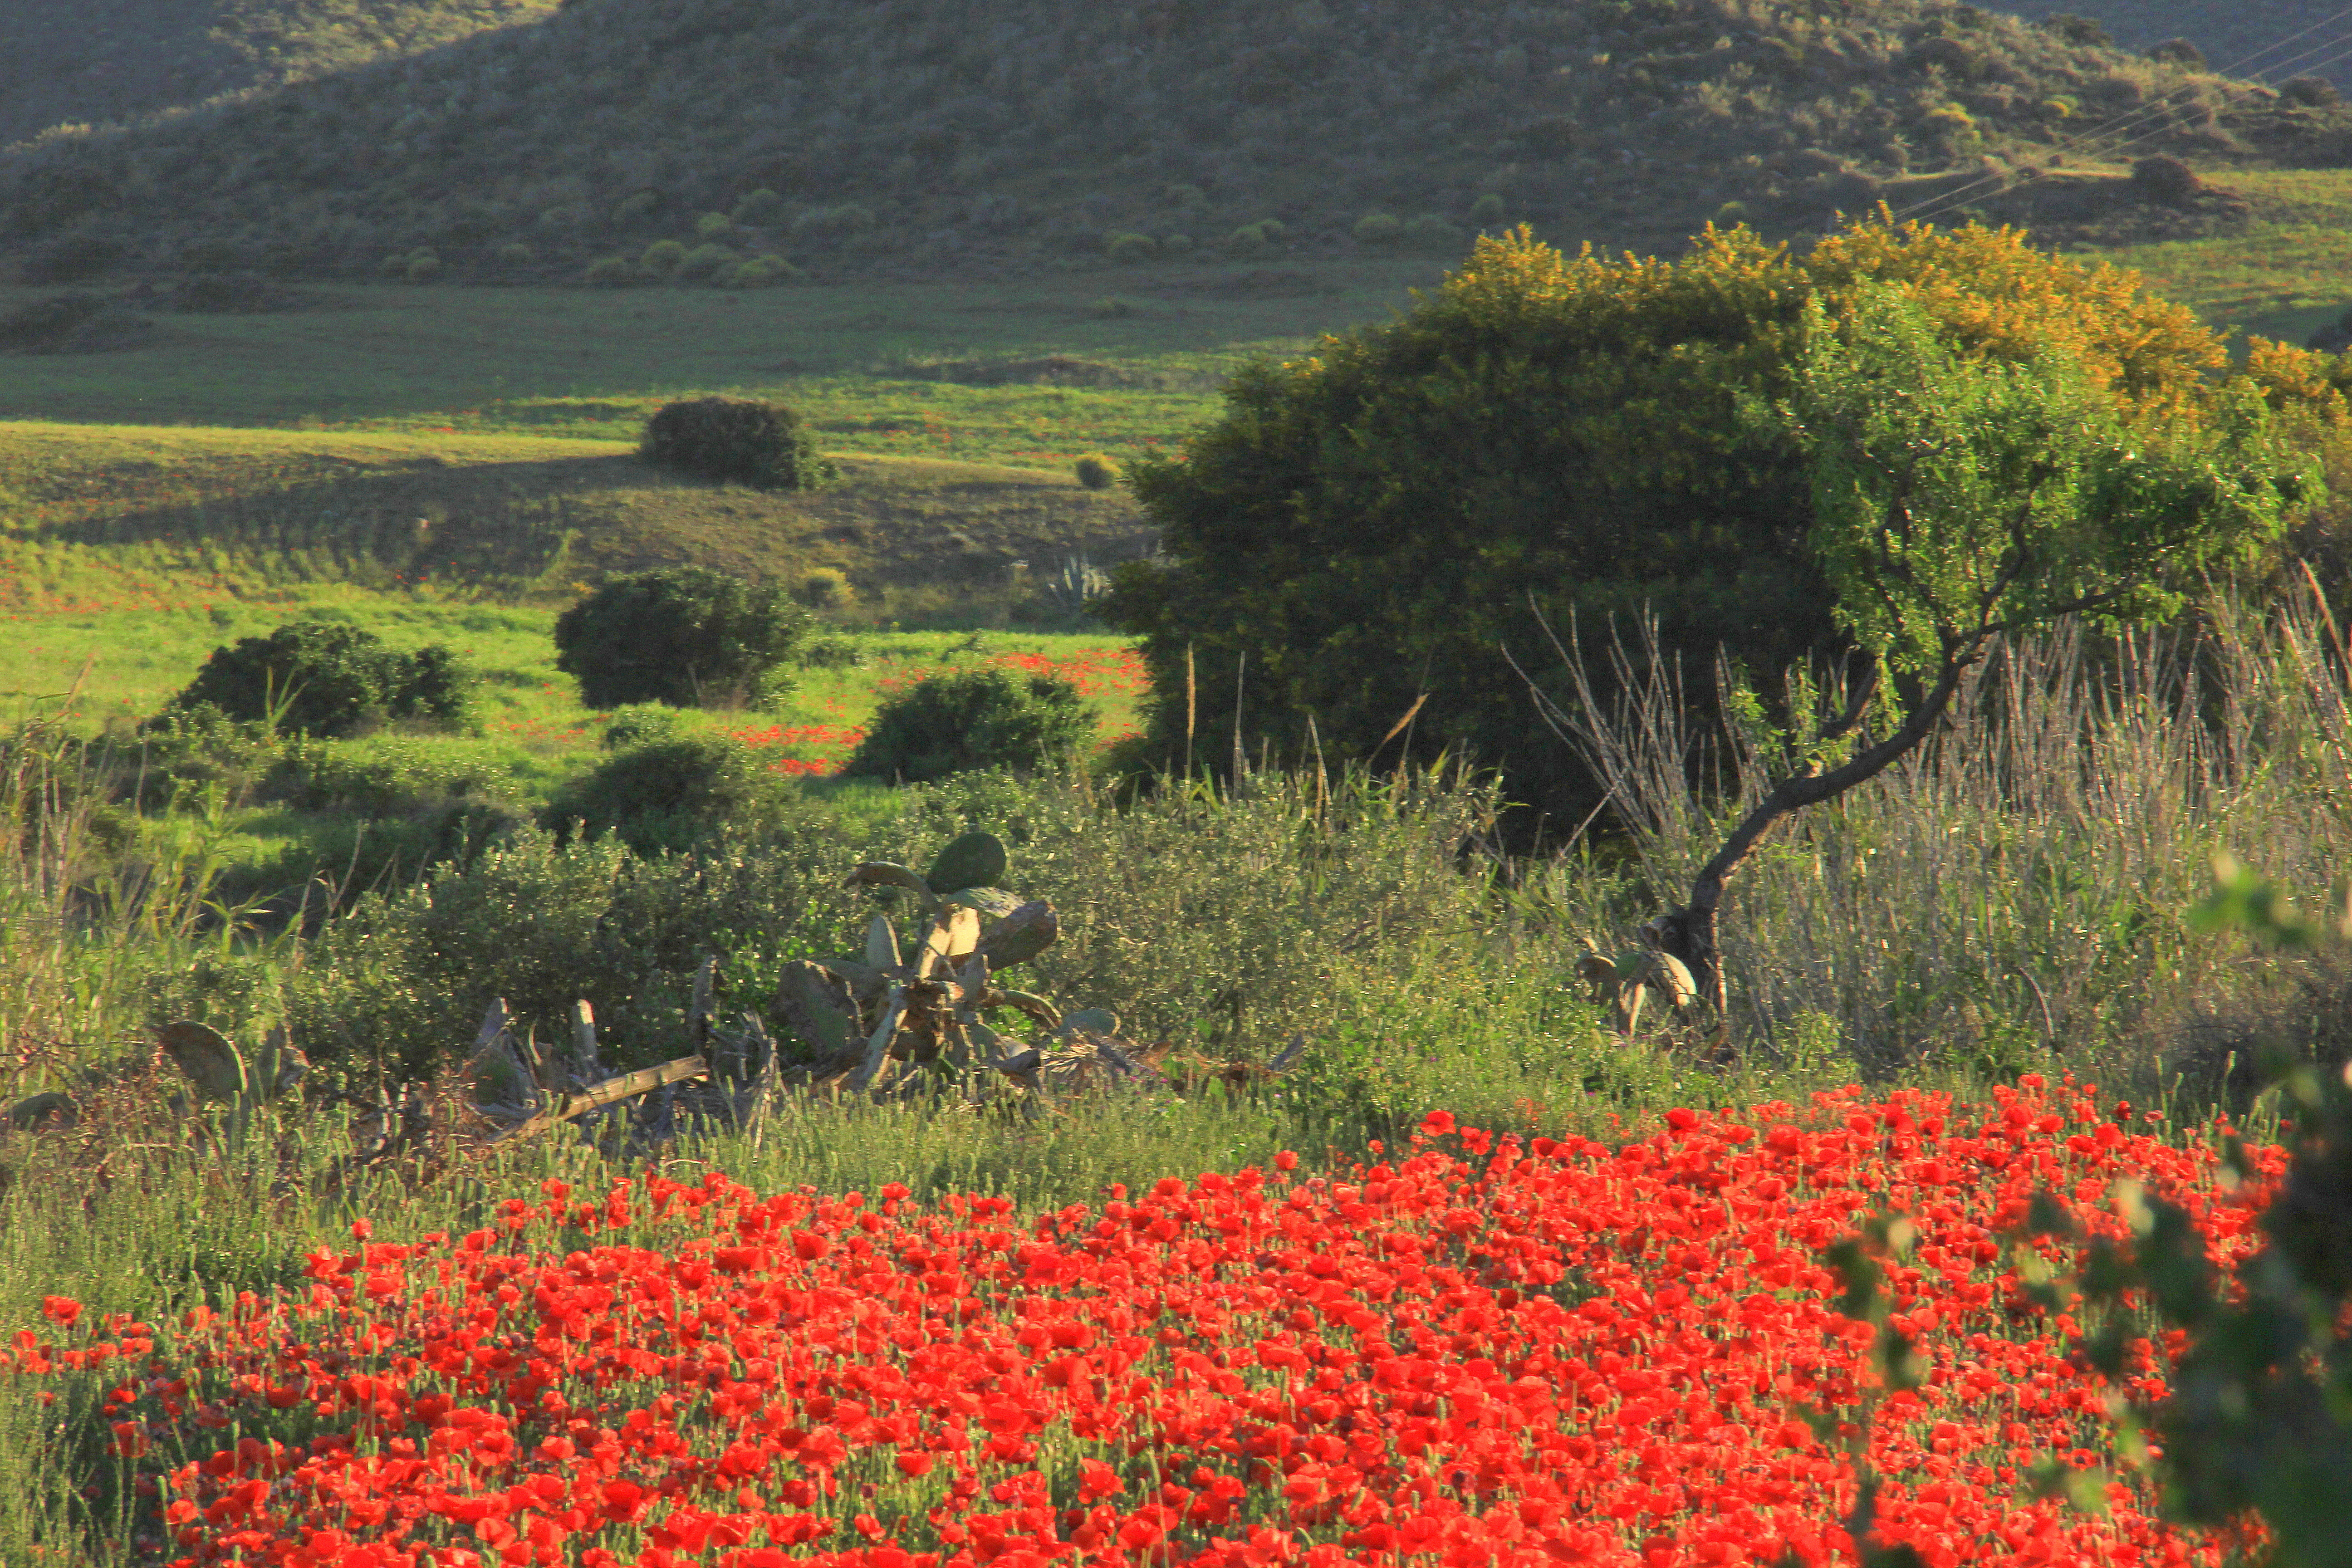 Almeria has beautiful natural beauty